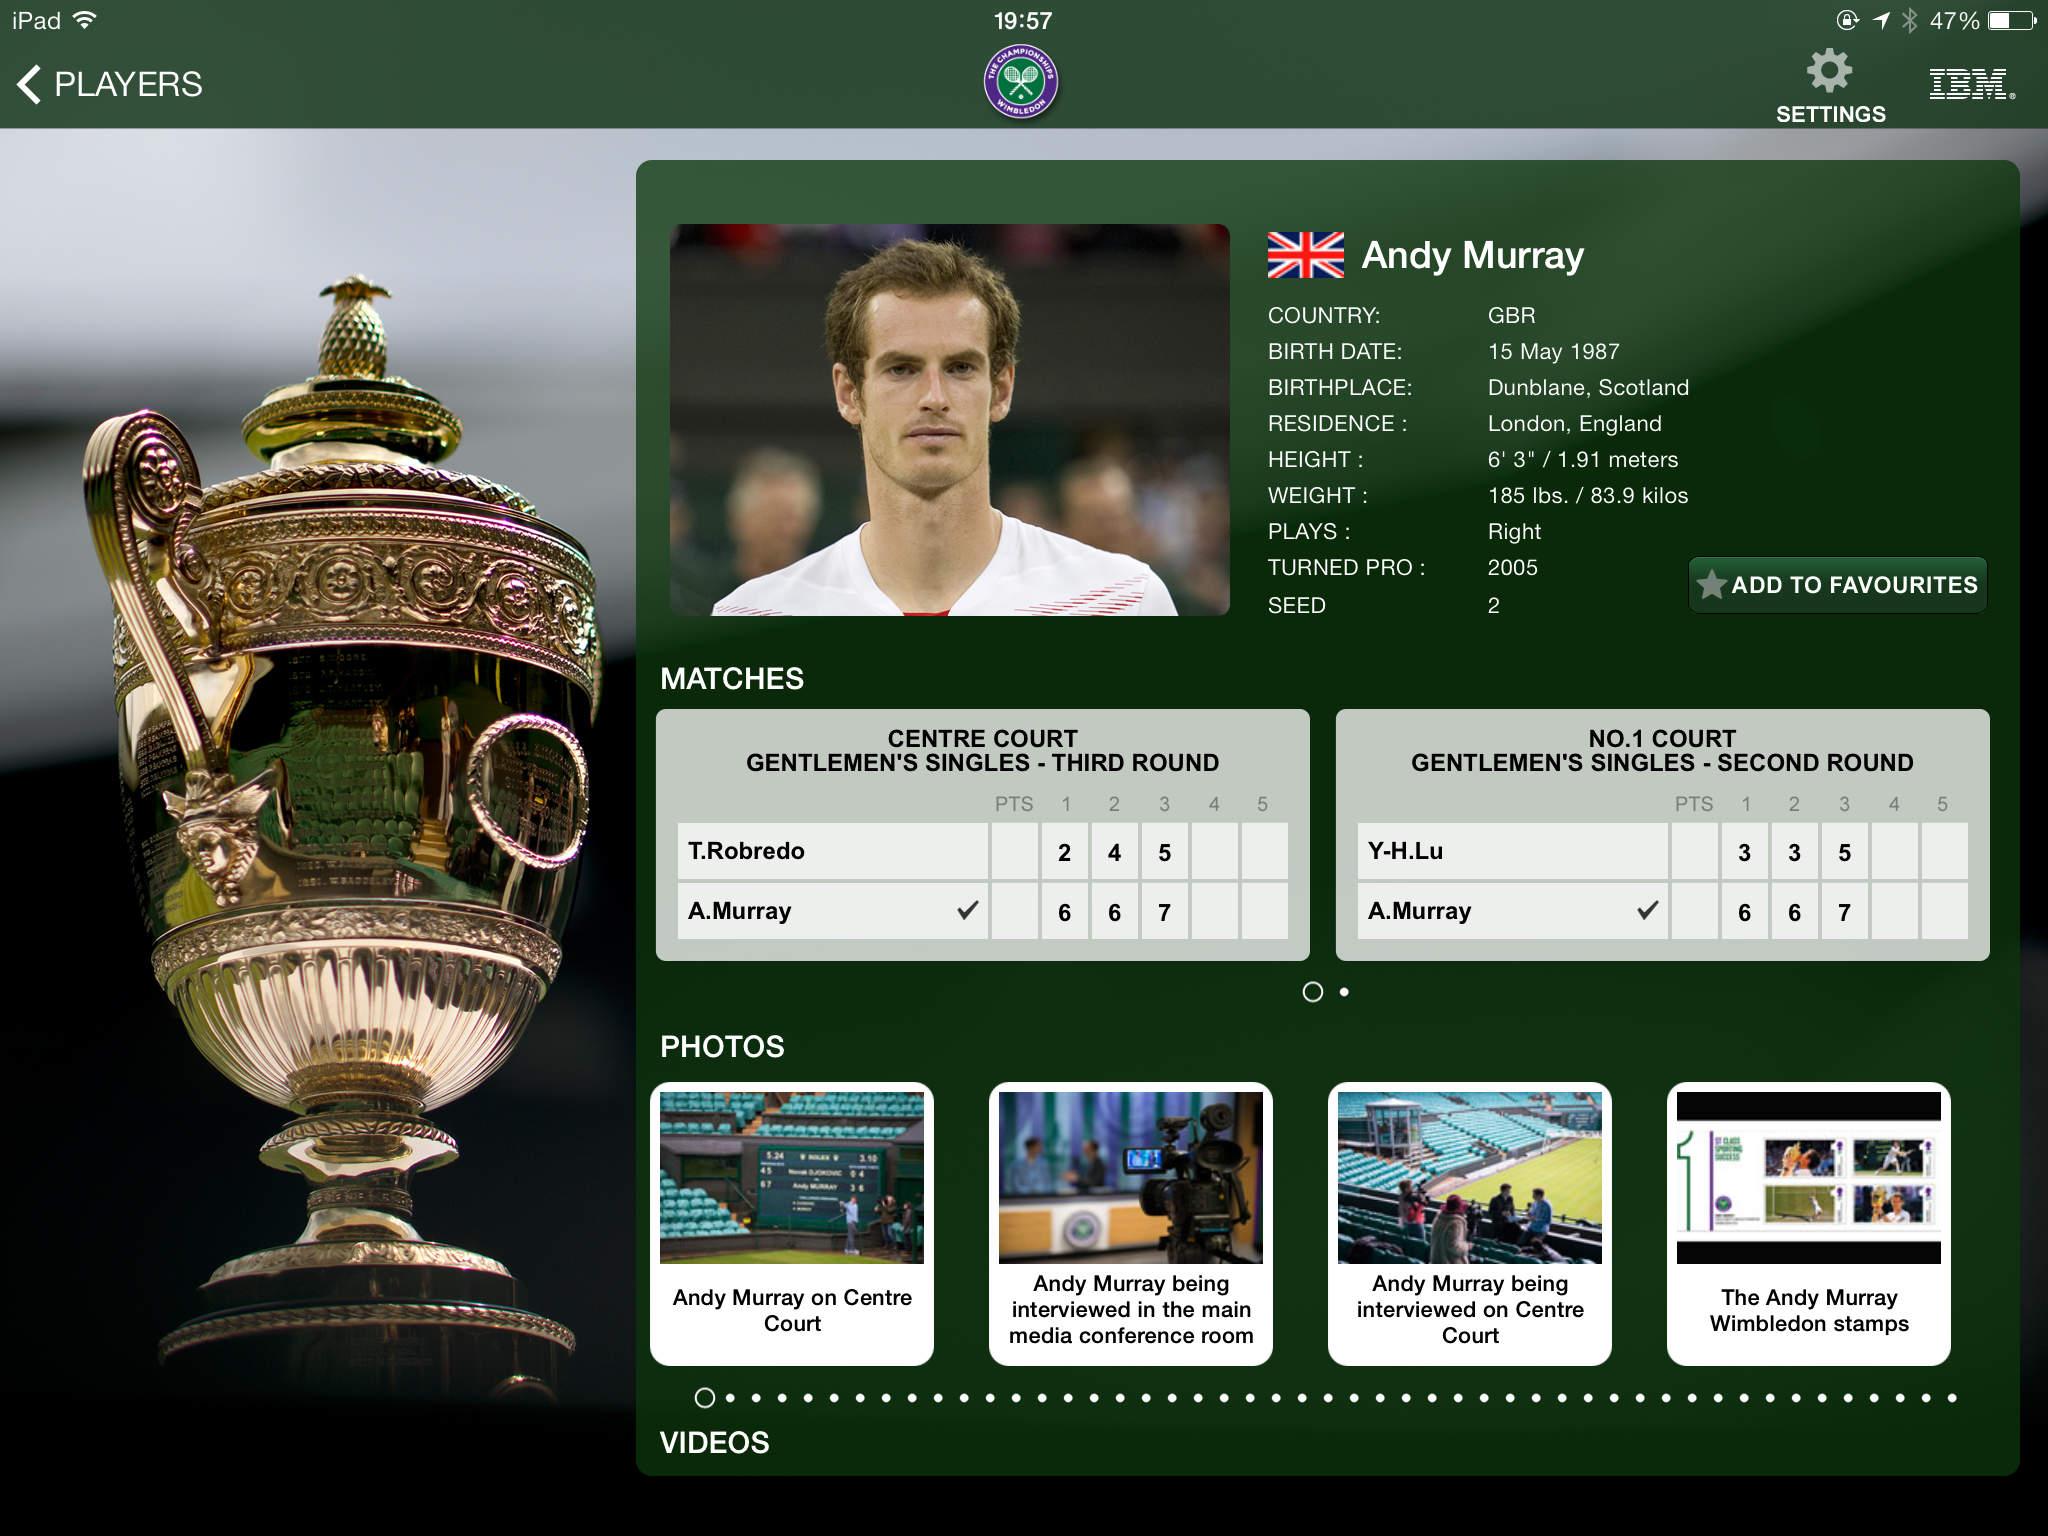 The Championships, Wimbledon 2015 - Grand Slam Tennis